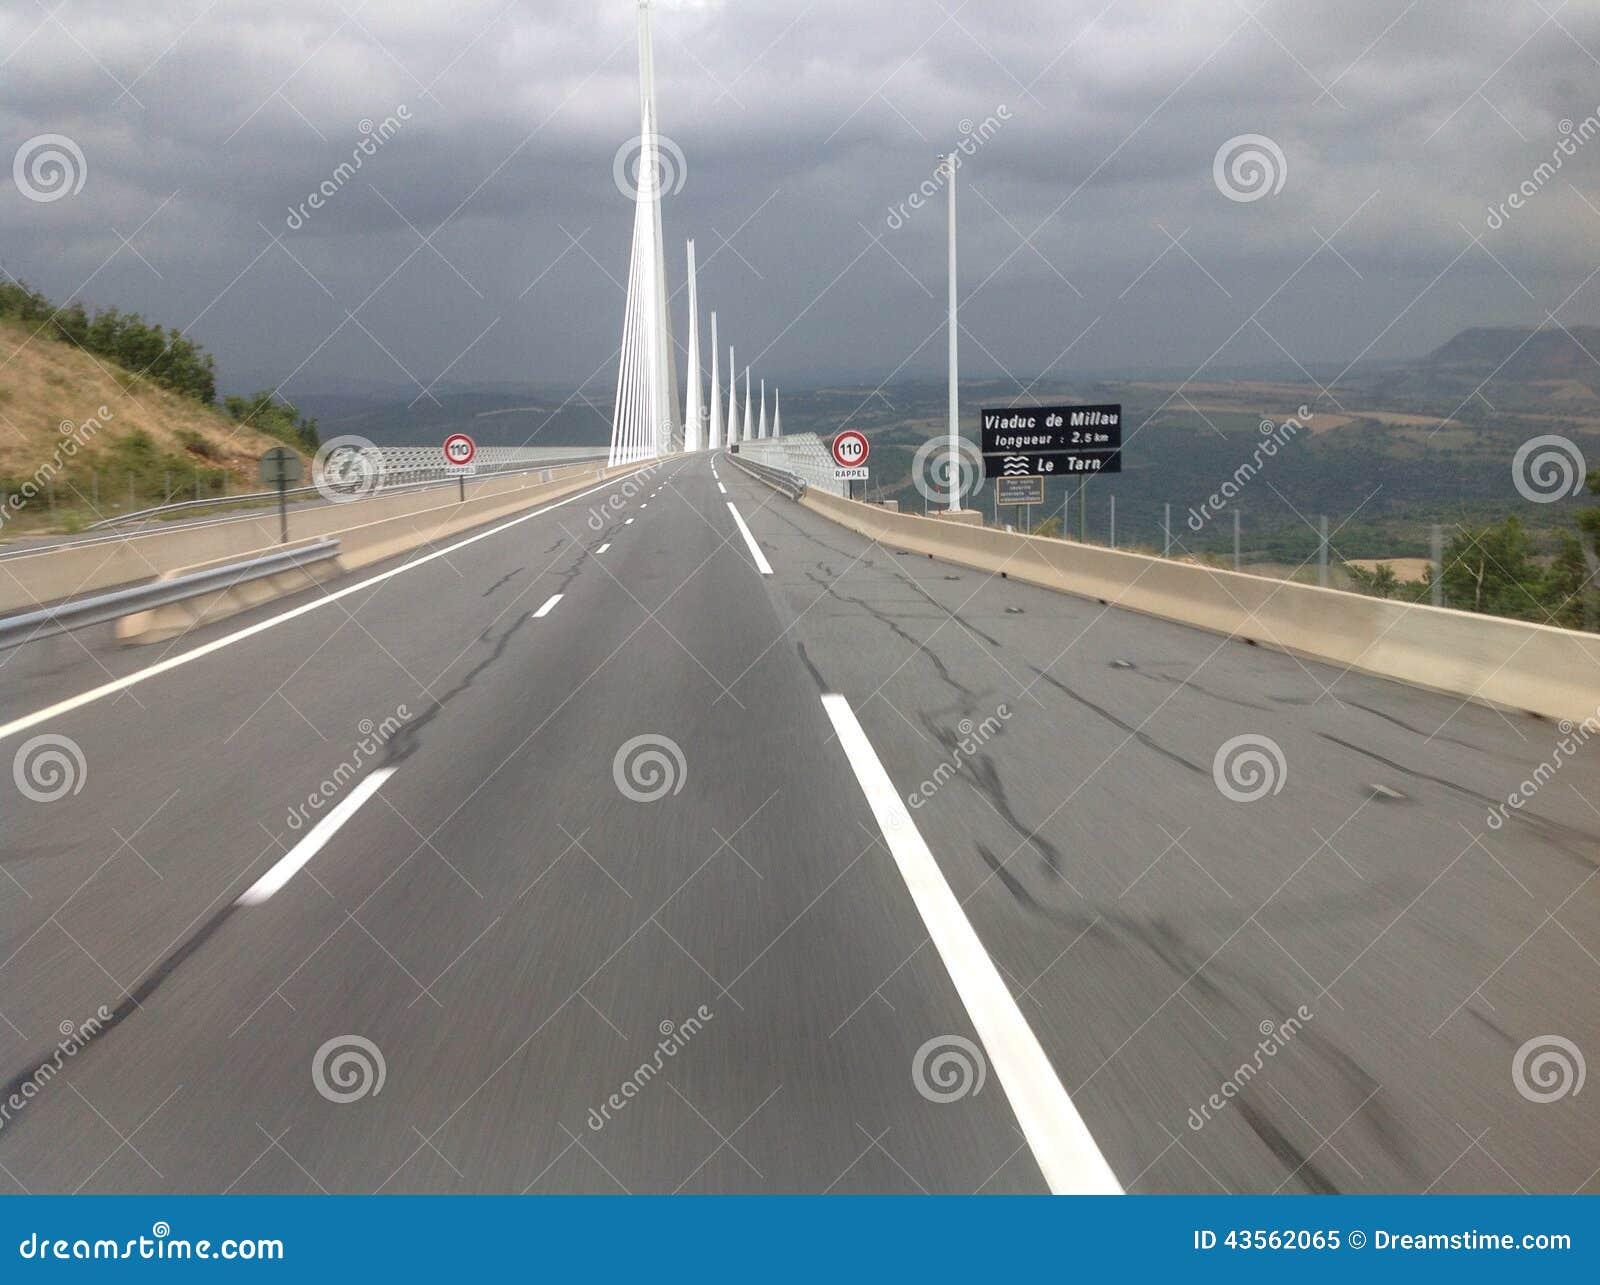 France Stock Image Of Viaduct Bridge